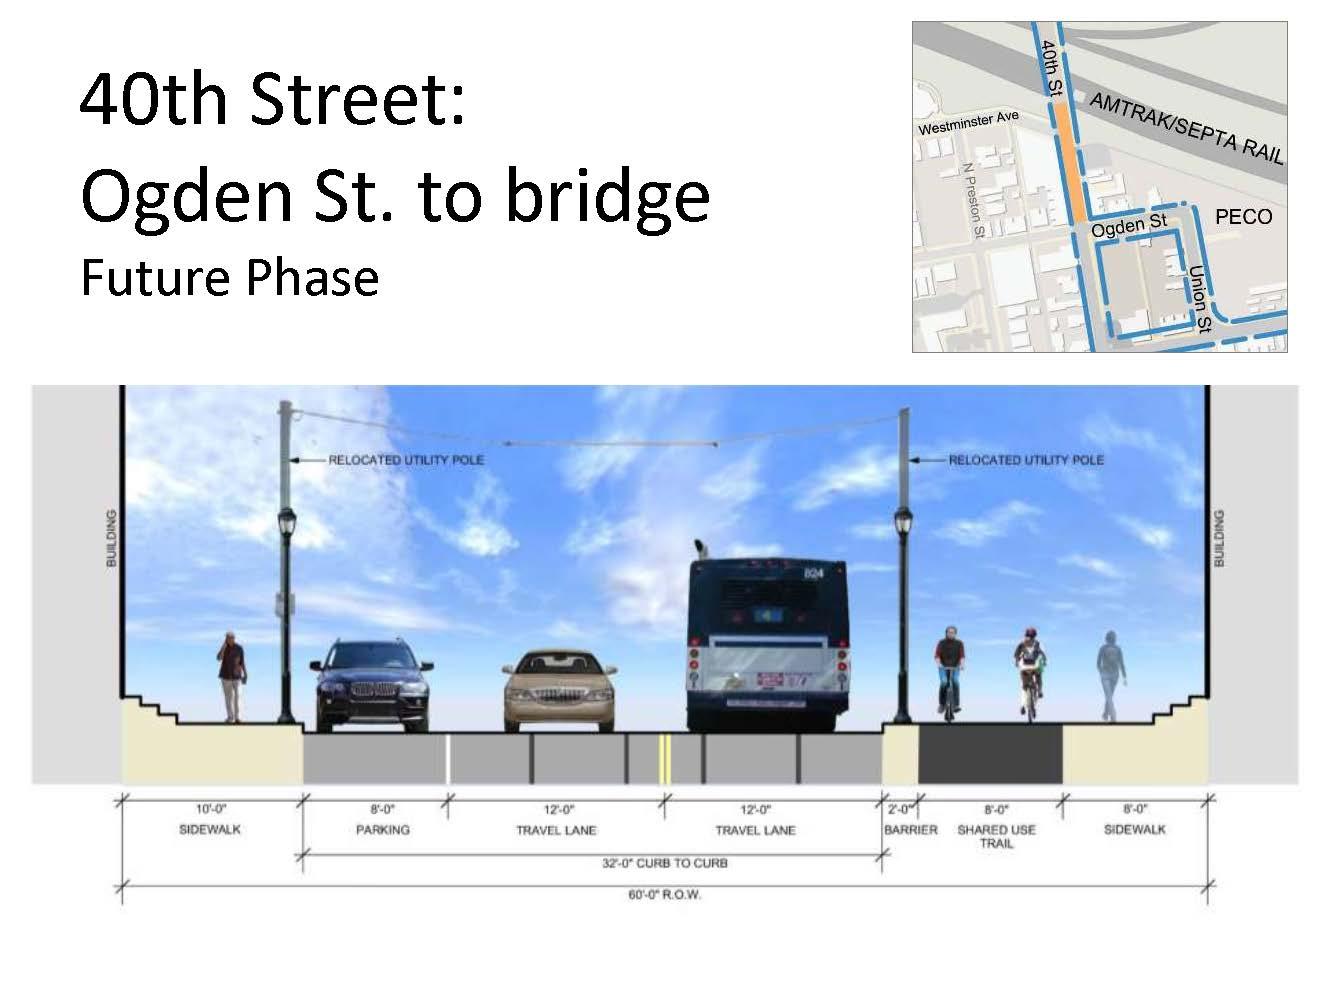 Design concepts for Preferred plans